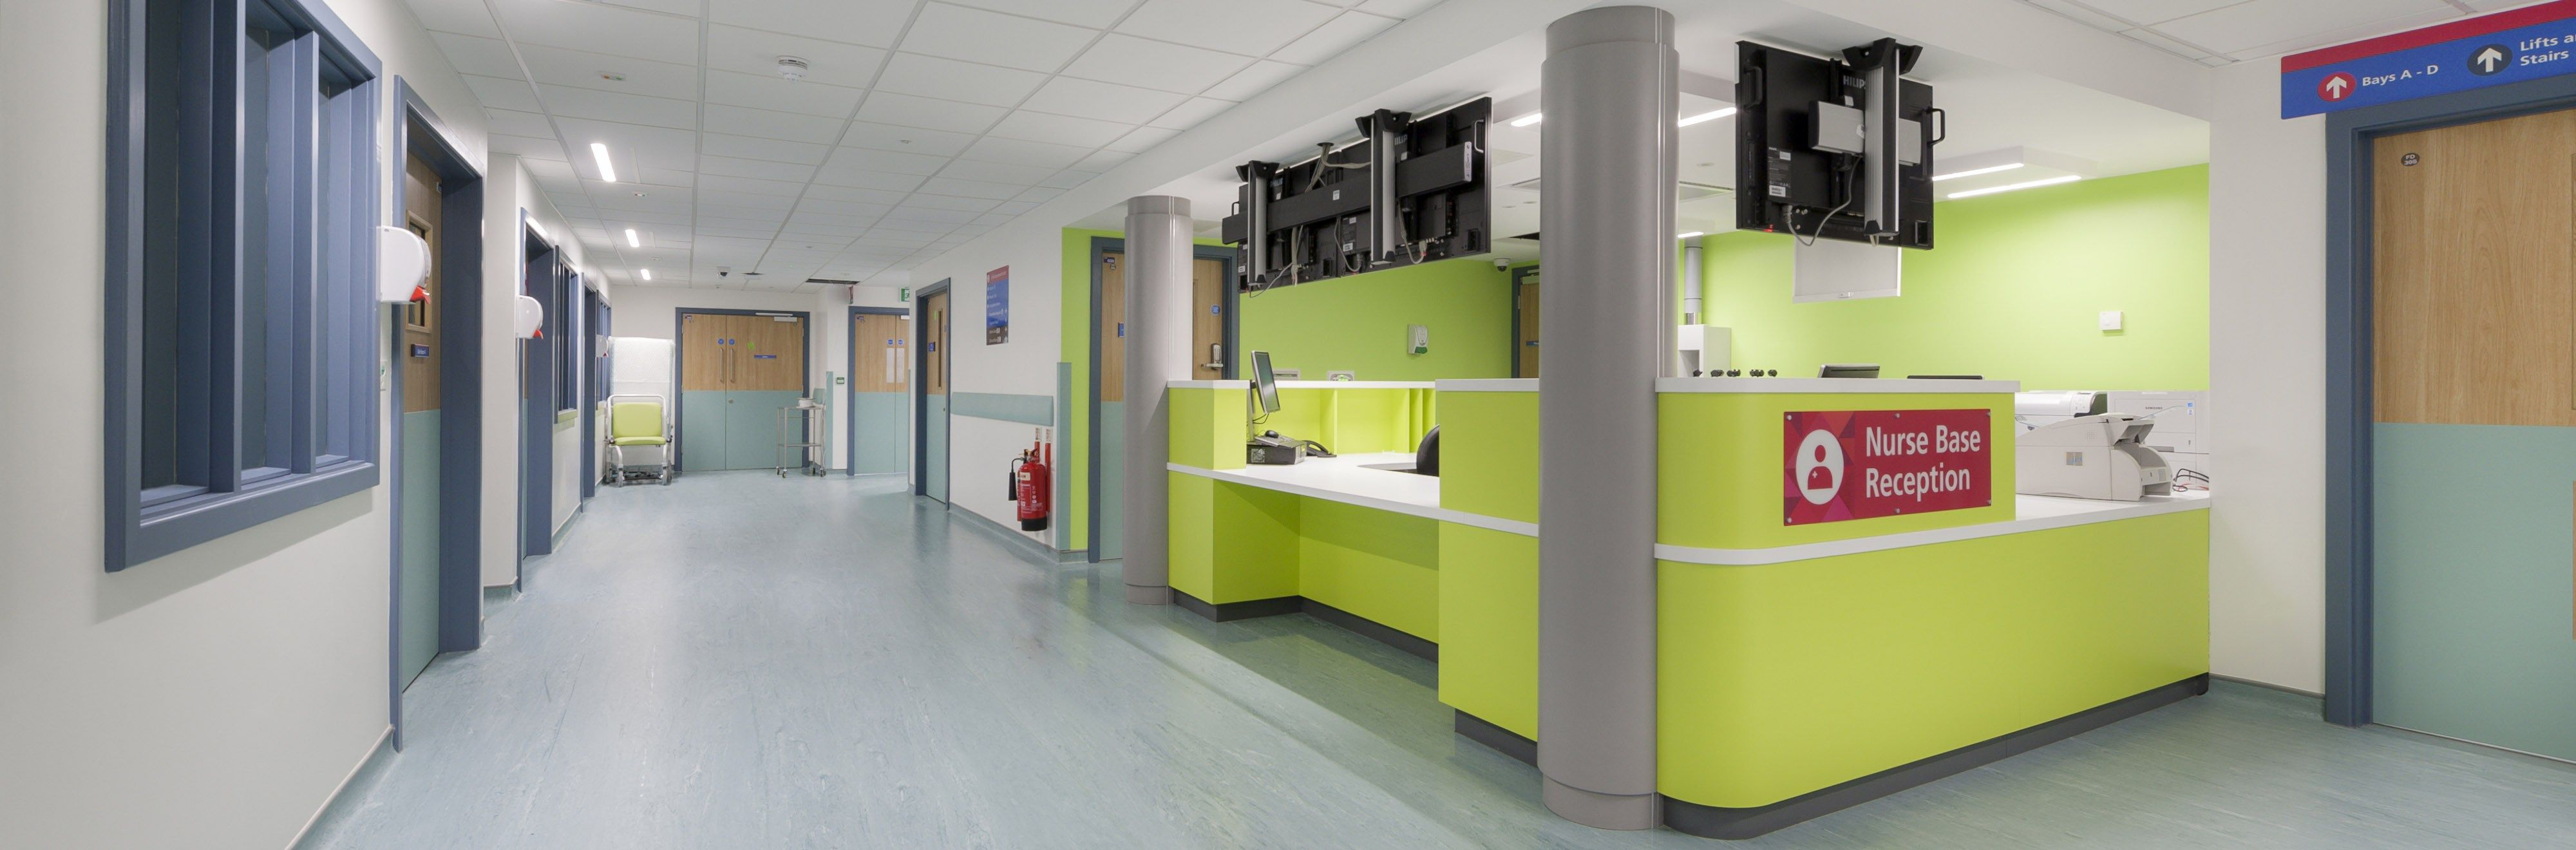 Northwick Park Hospital In December 2014 Mtx Were Awarded The  # Muebles Kowalczuk